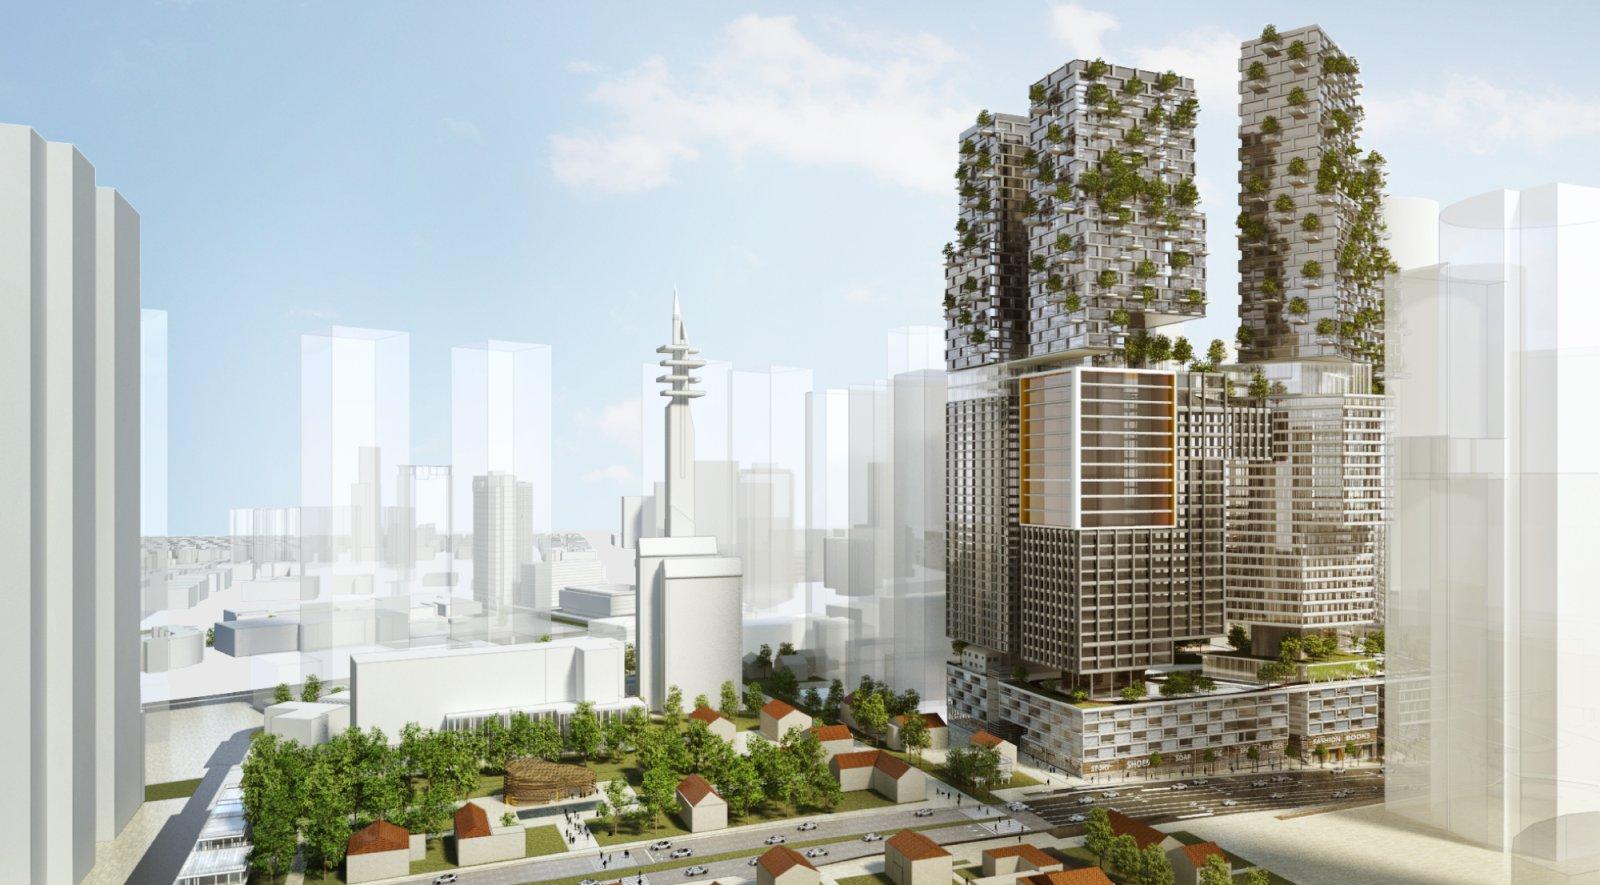 Kaplan north masterplan by kimmel eshkolot architects for Architecture kapla